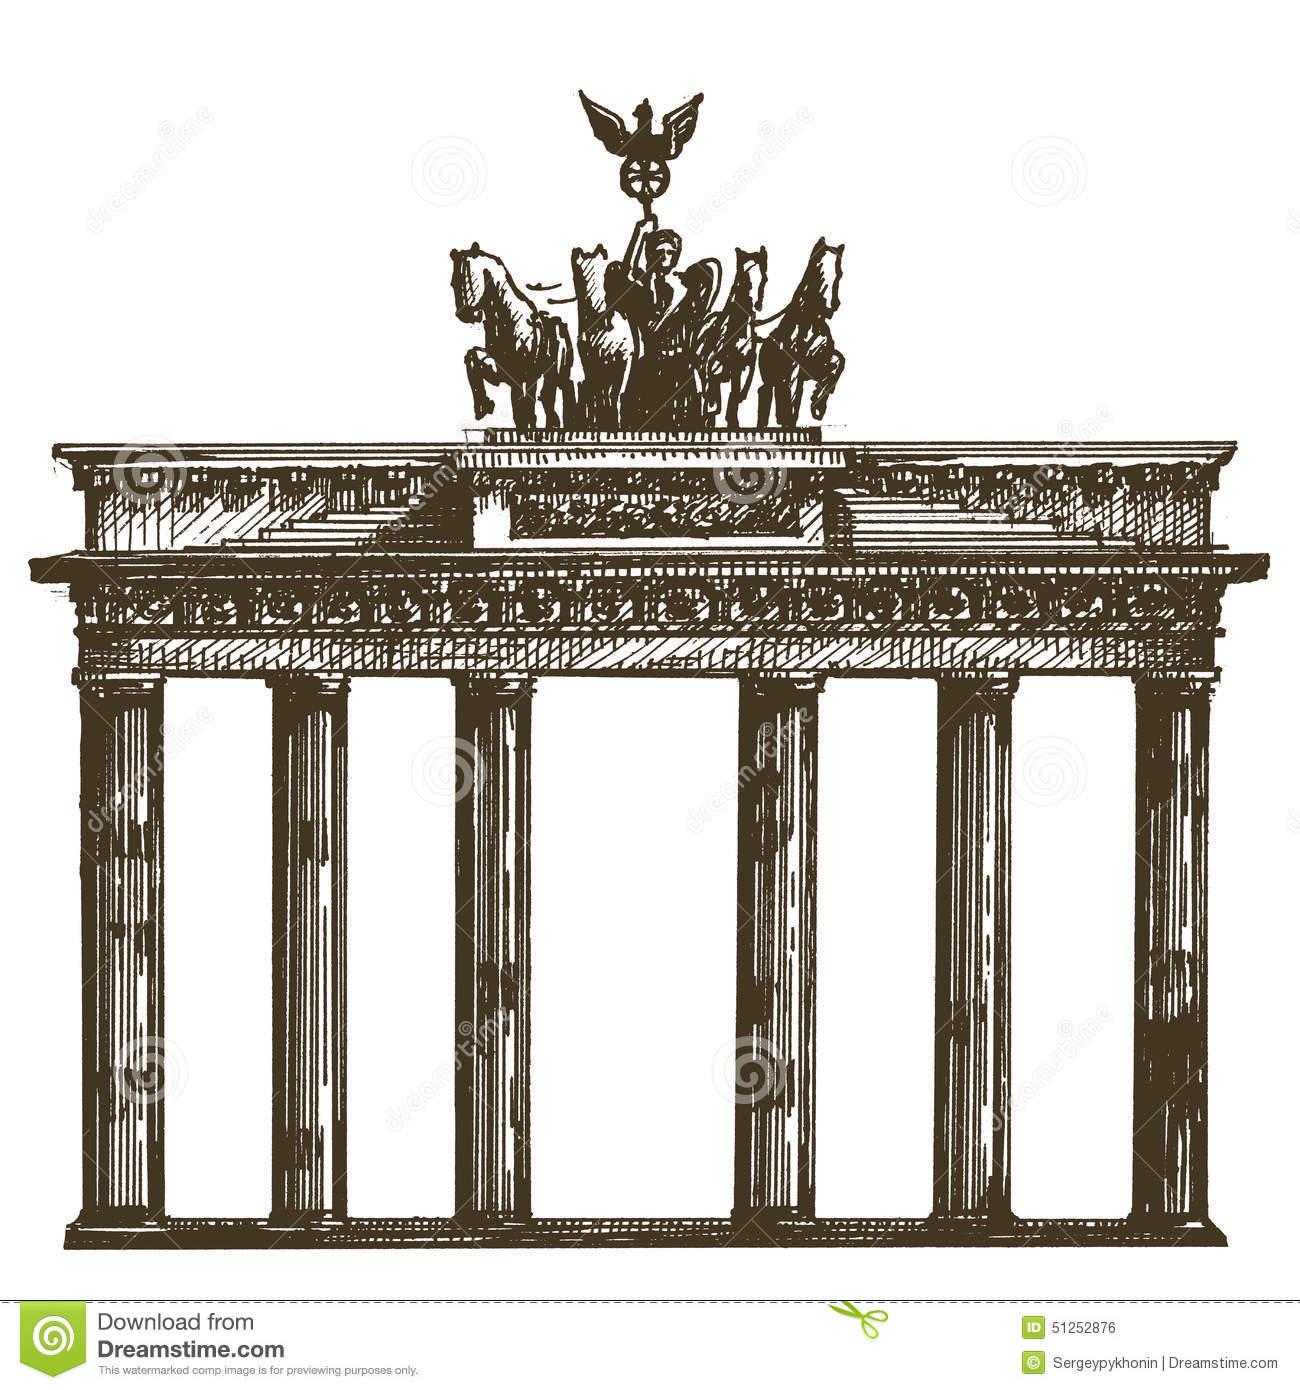 The Brandenburg Gate In Berlin. Hand Drawn Pencil Sketch.